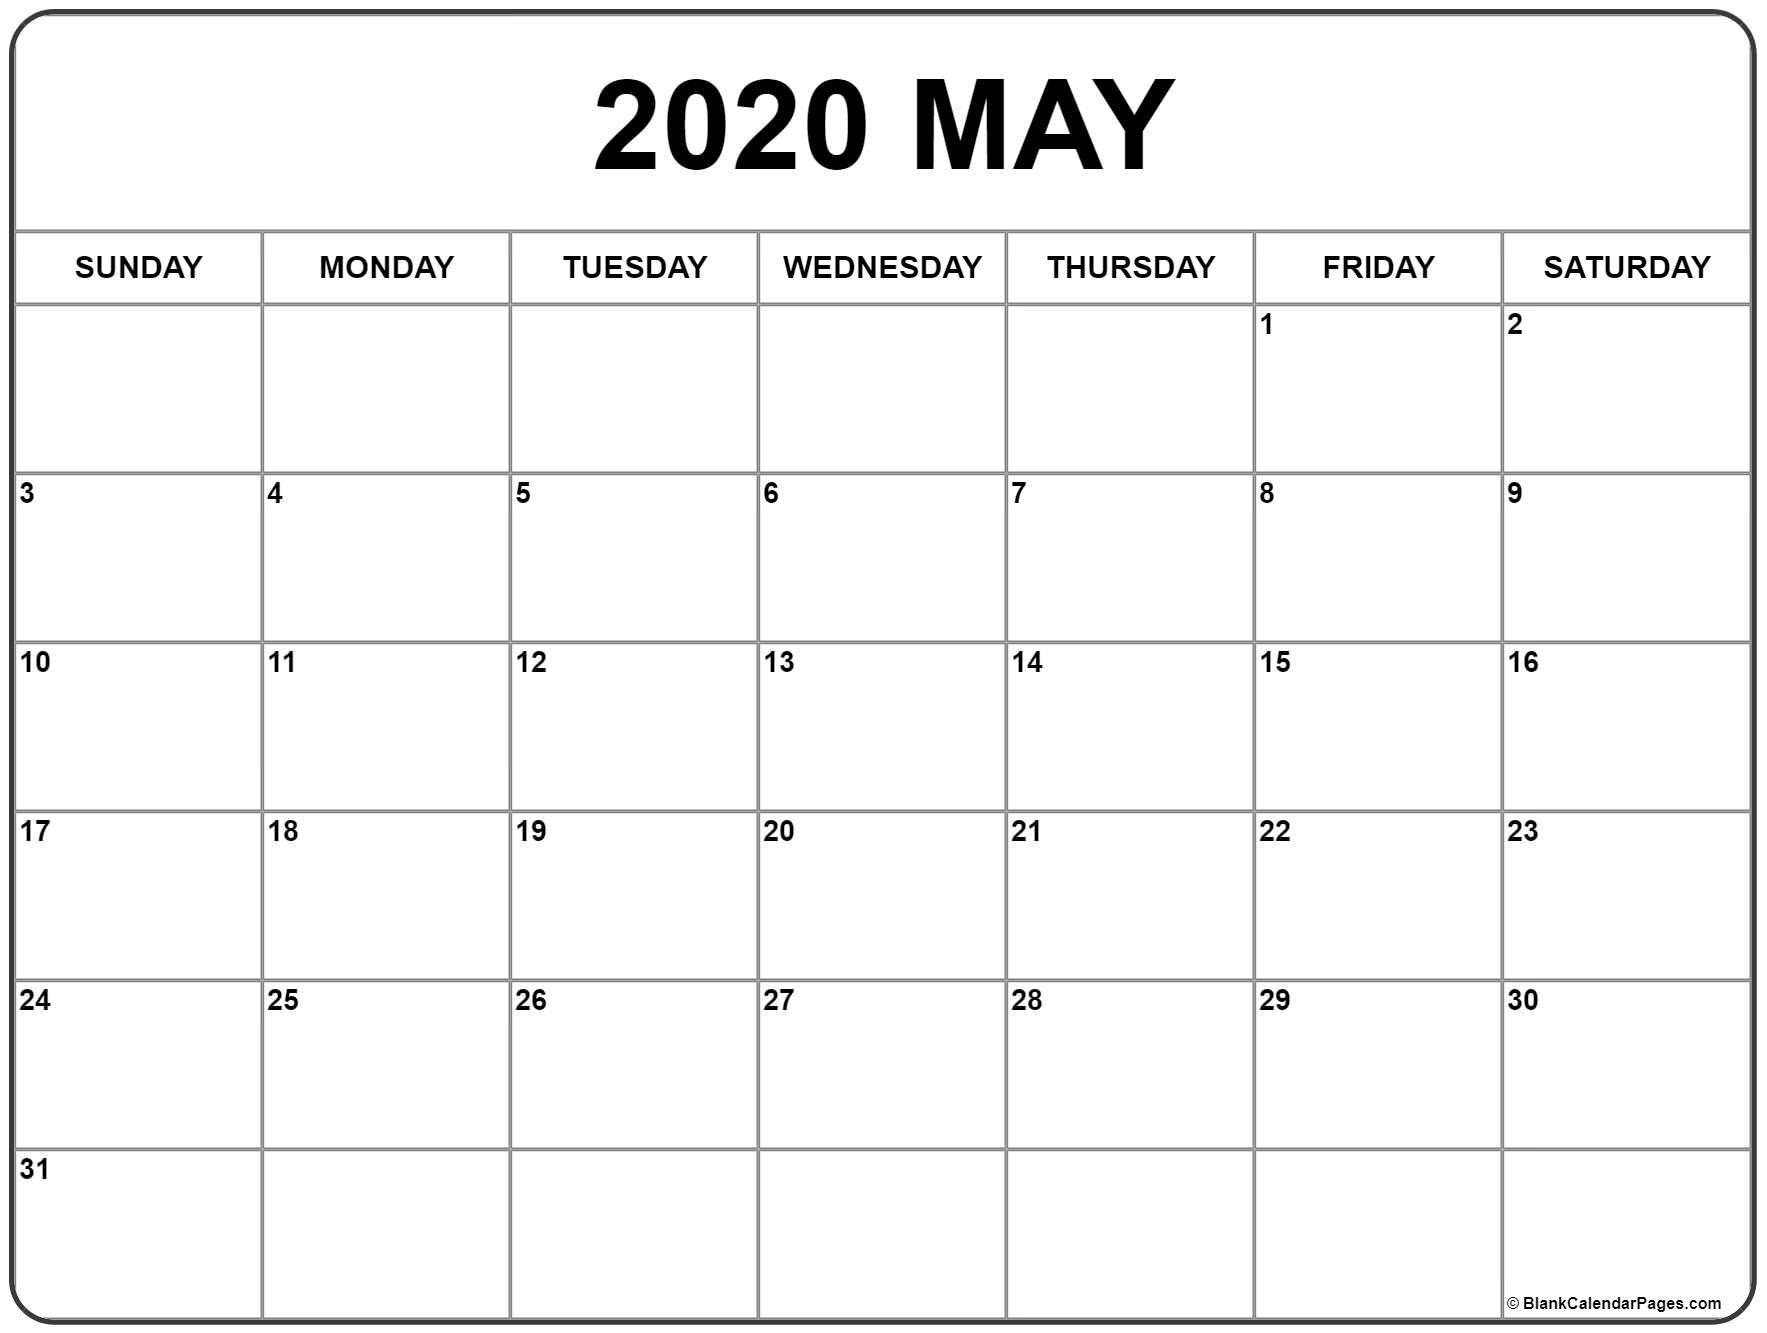 May 2020 Calendar | Free Printable Monthly Calendars  Blank Calendar 2020